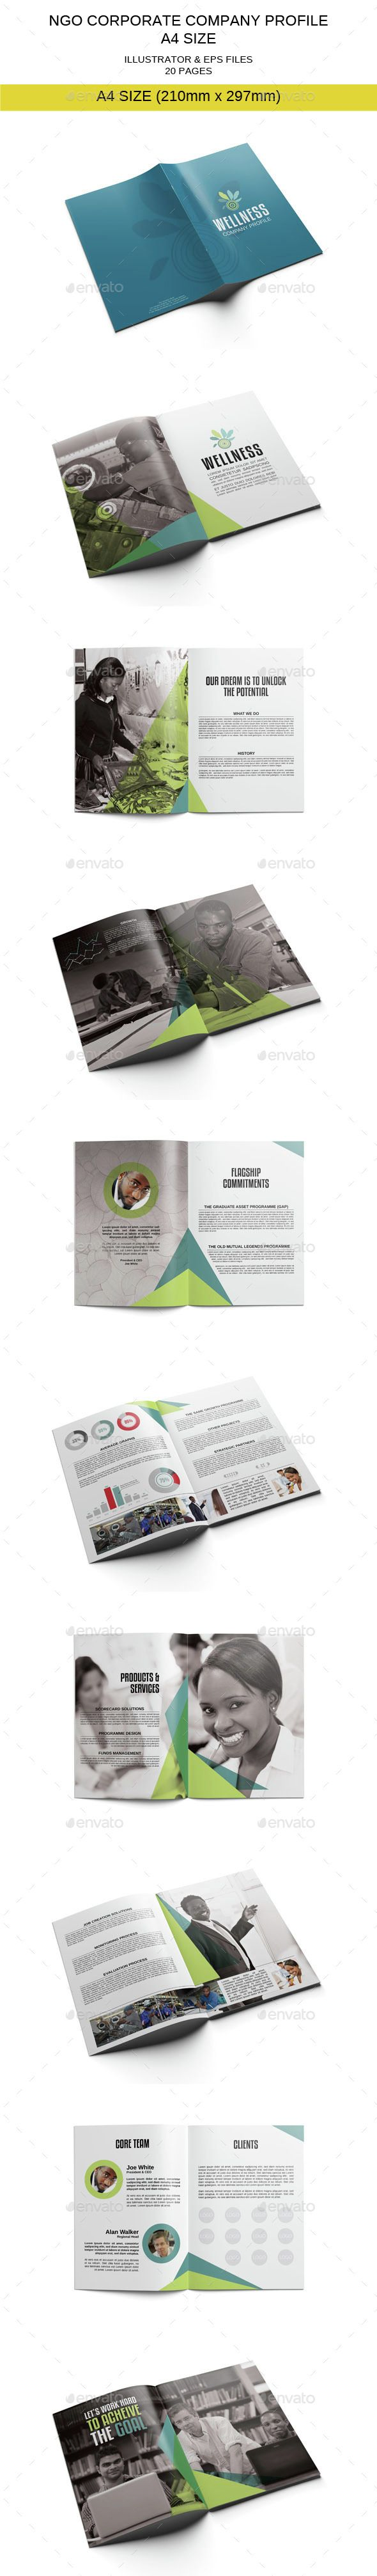 Ngo Corporate Company Profile Template Company Profile Template Company Profile Brochure Design Samples